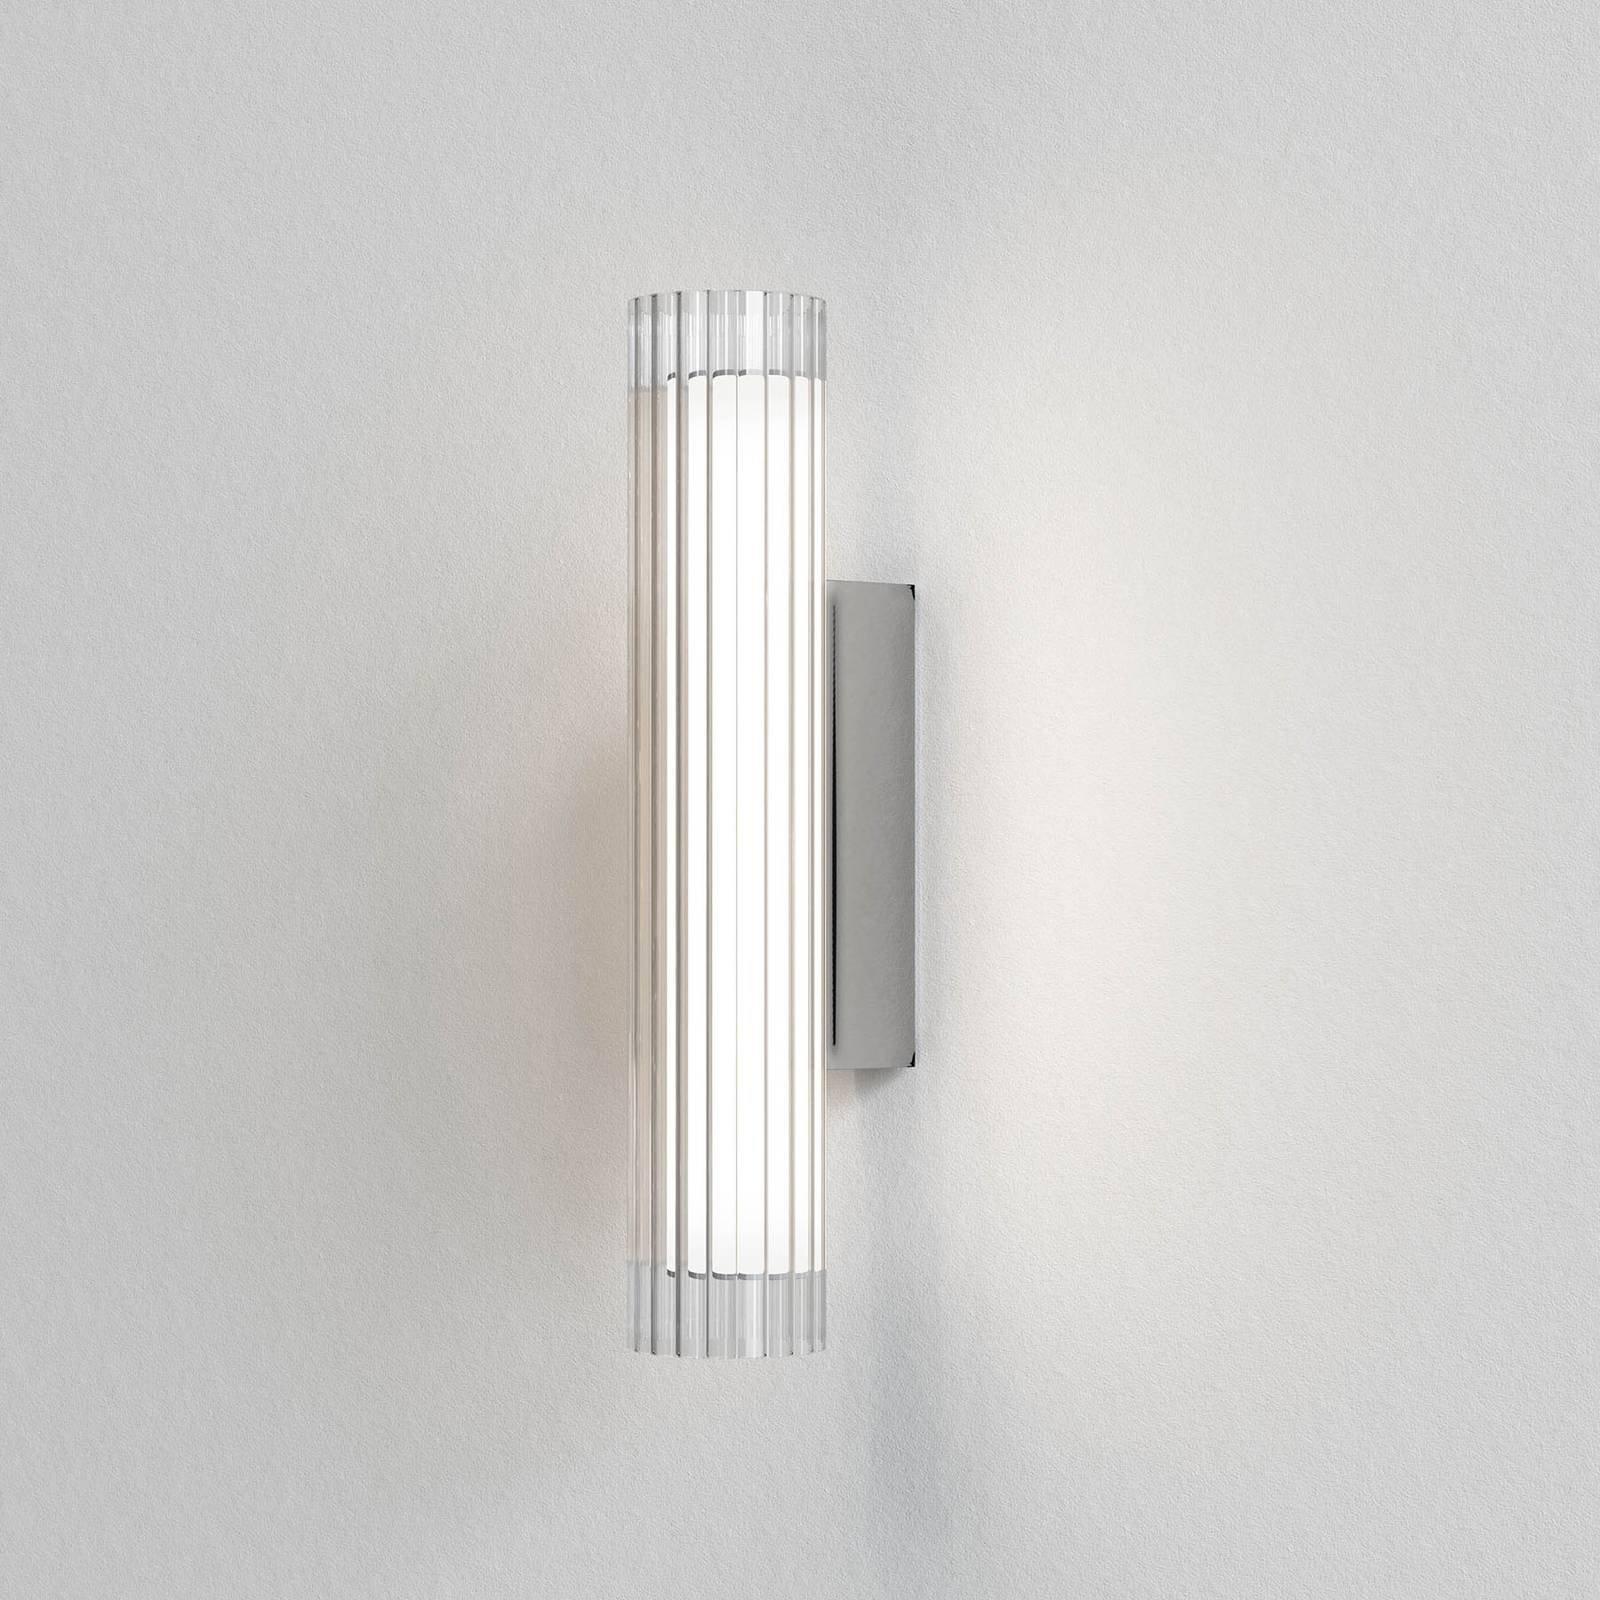 Astro io Wall LED-vegglampe IP44, krom, 42 cm